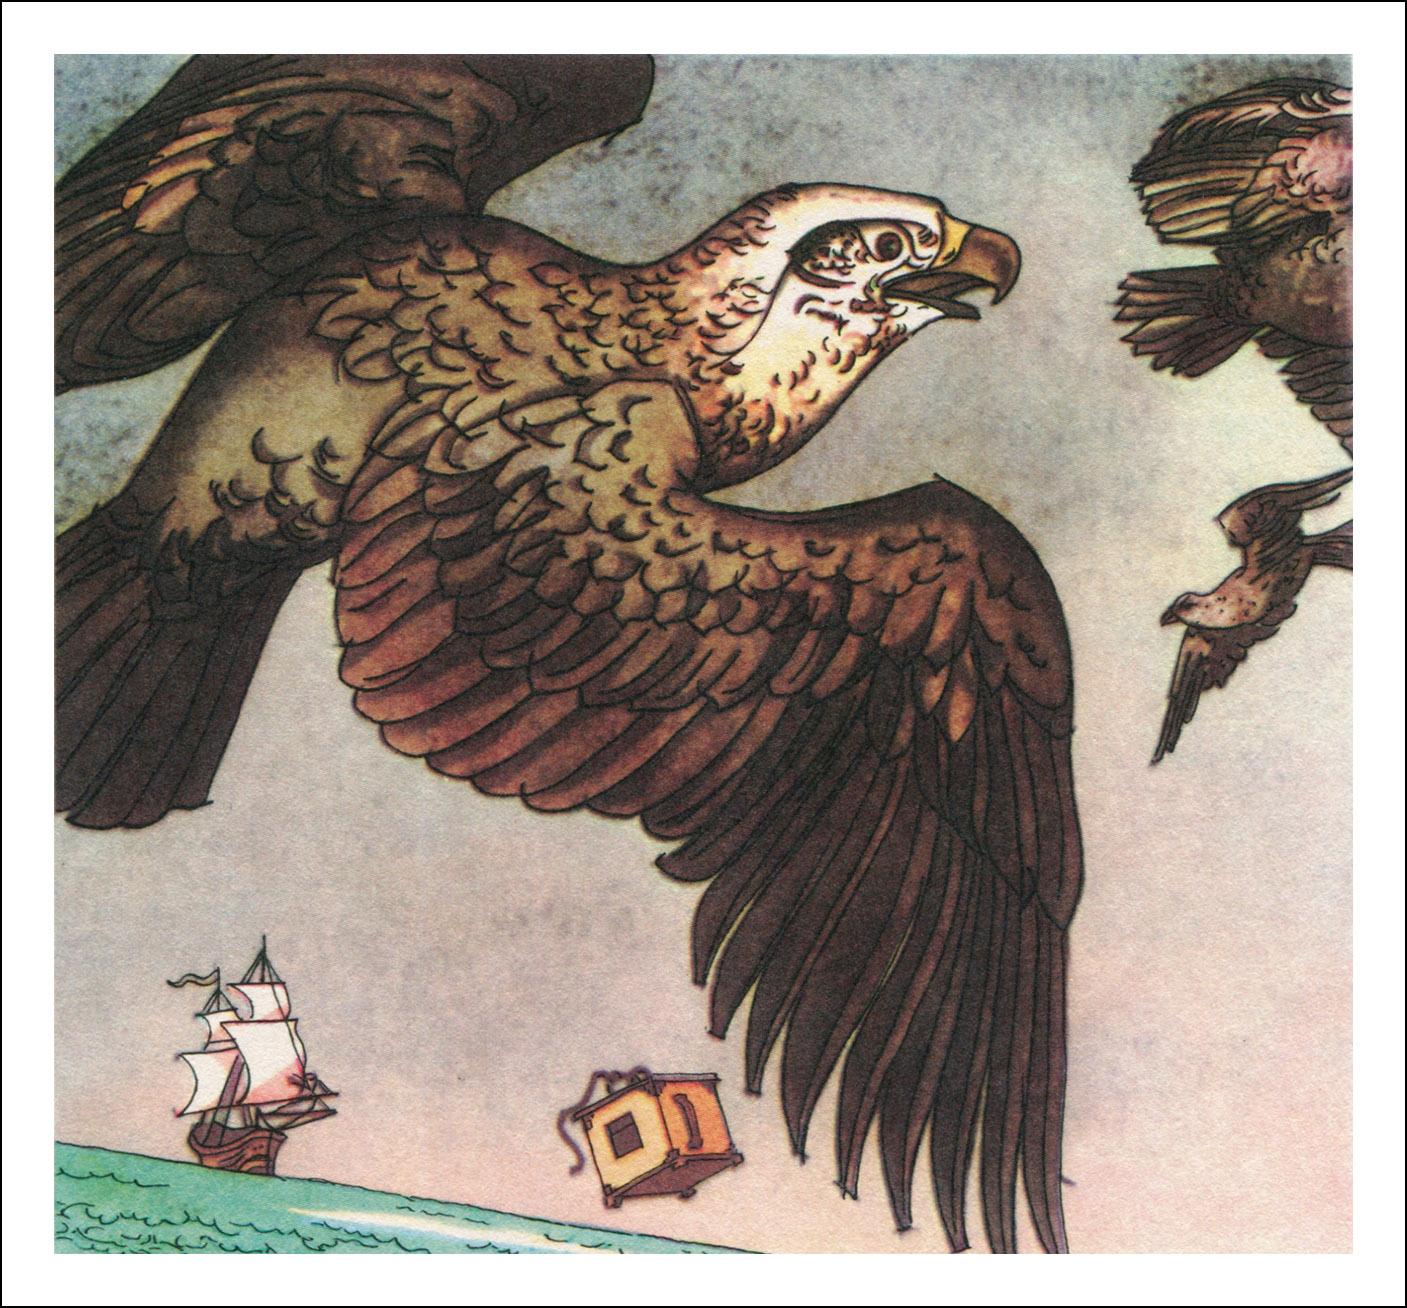 Vincent Hloznik, Les voyages de Gulliver